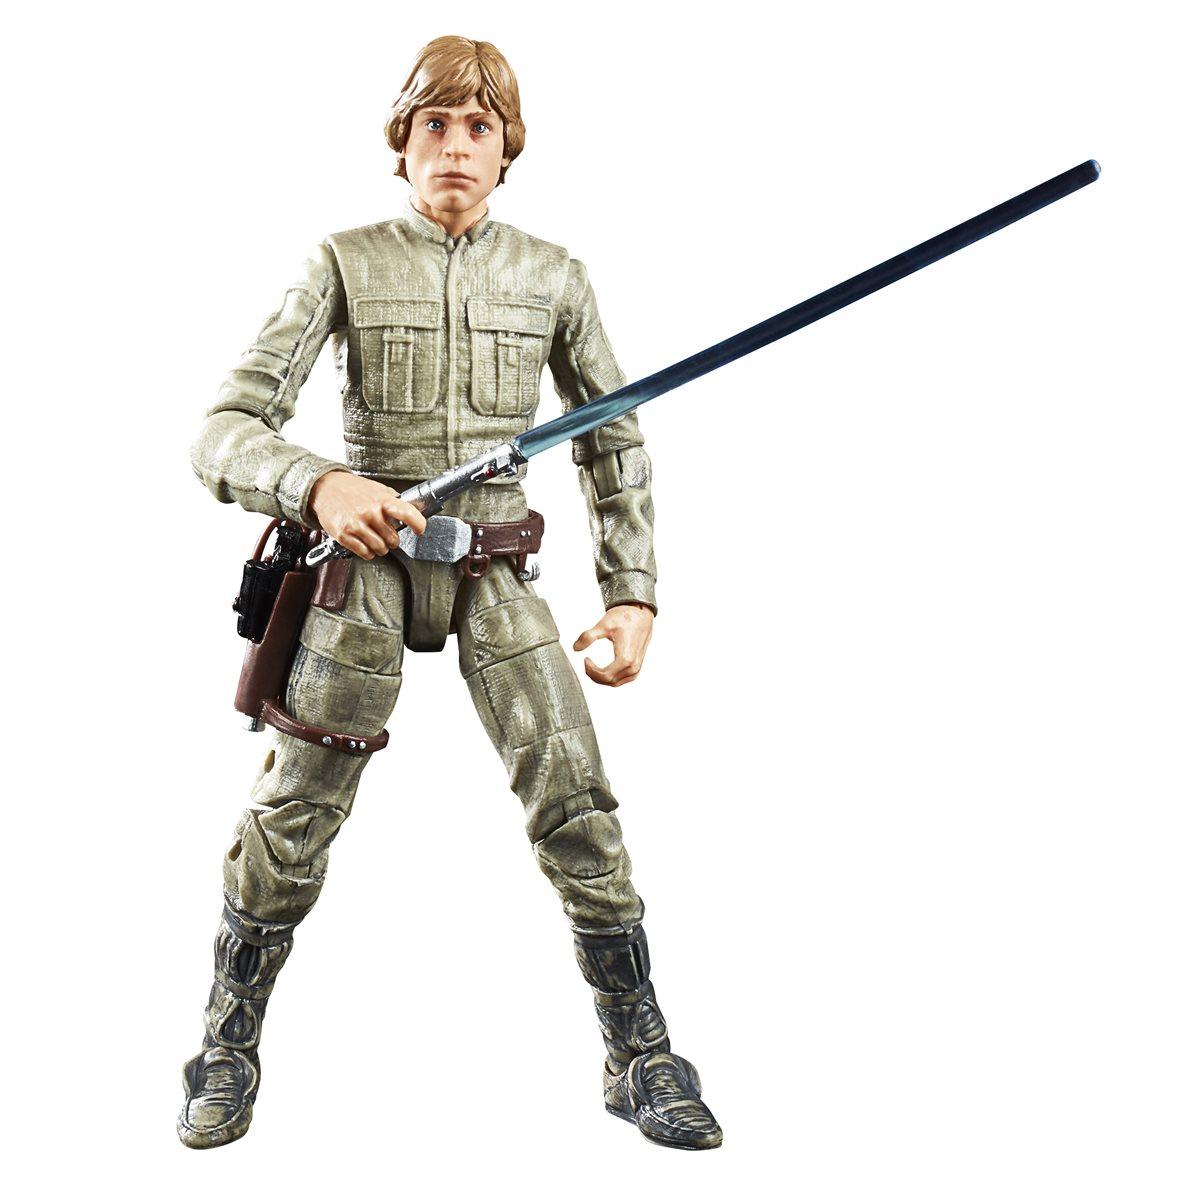 Star Wars The Black Series Luke Skywalker Bespin 6-Inch 40th Anniversary Figure